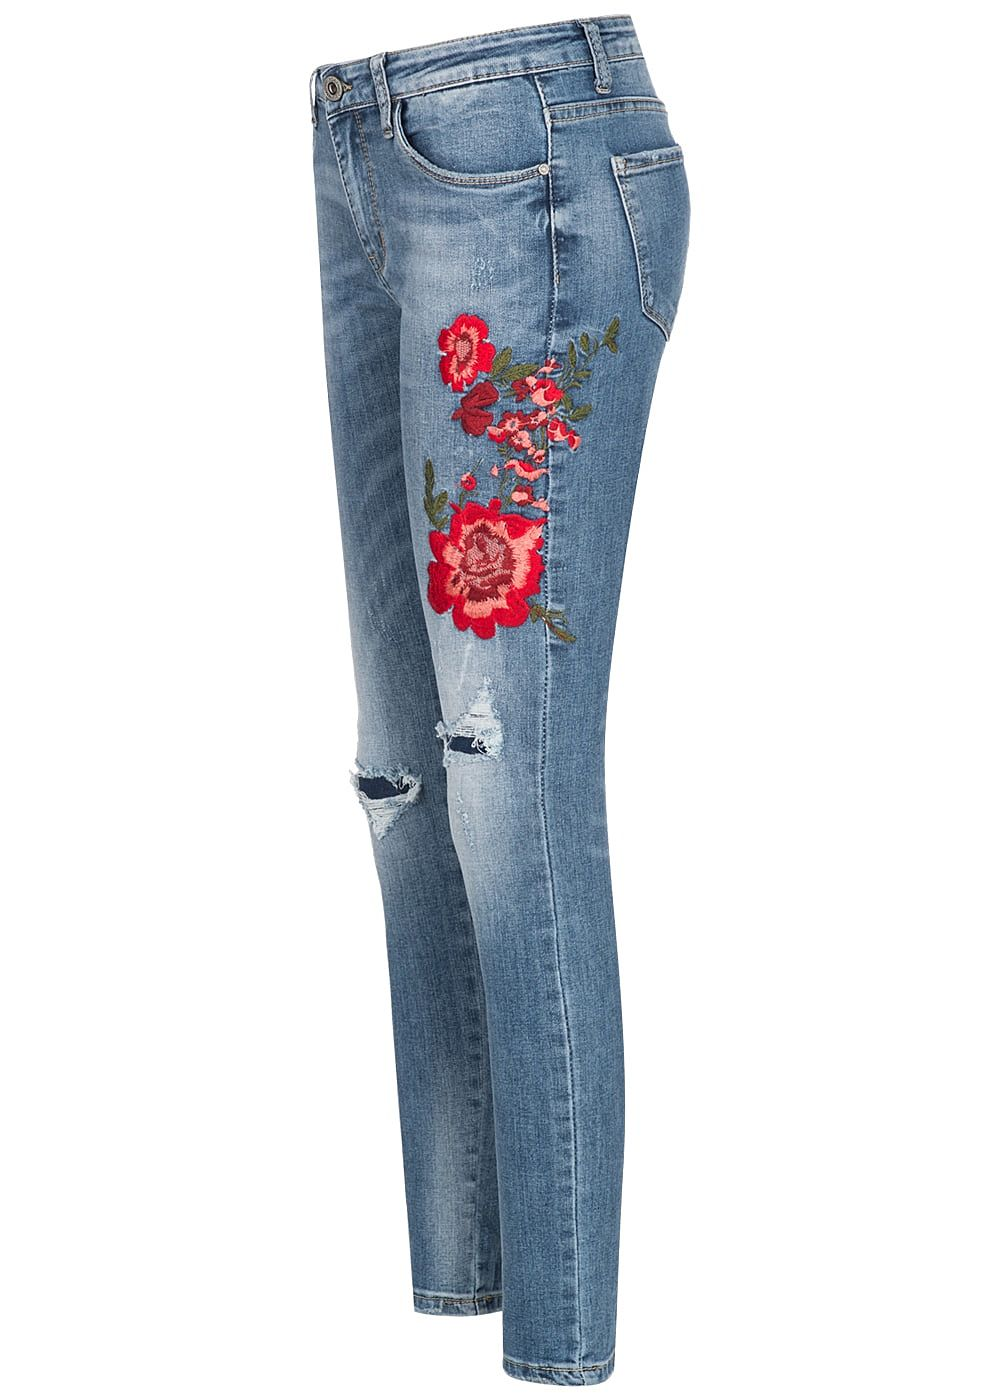 91bb22ee4bb515 Hailys Damen Jeans Hose Blumen Patch Destroy Look 5-Pockets medium ...